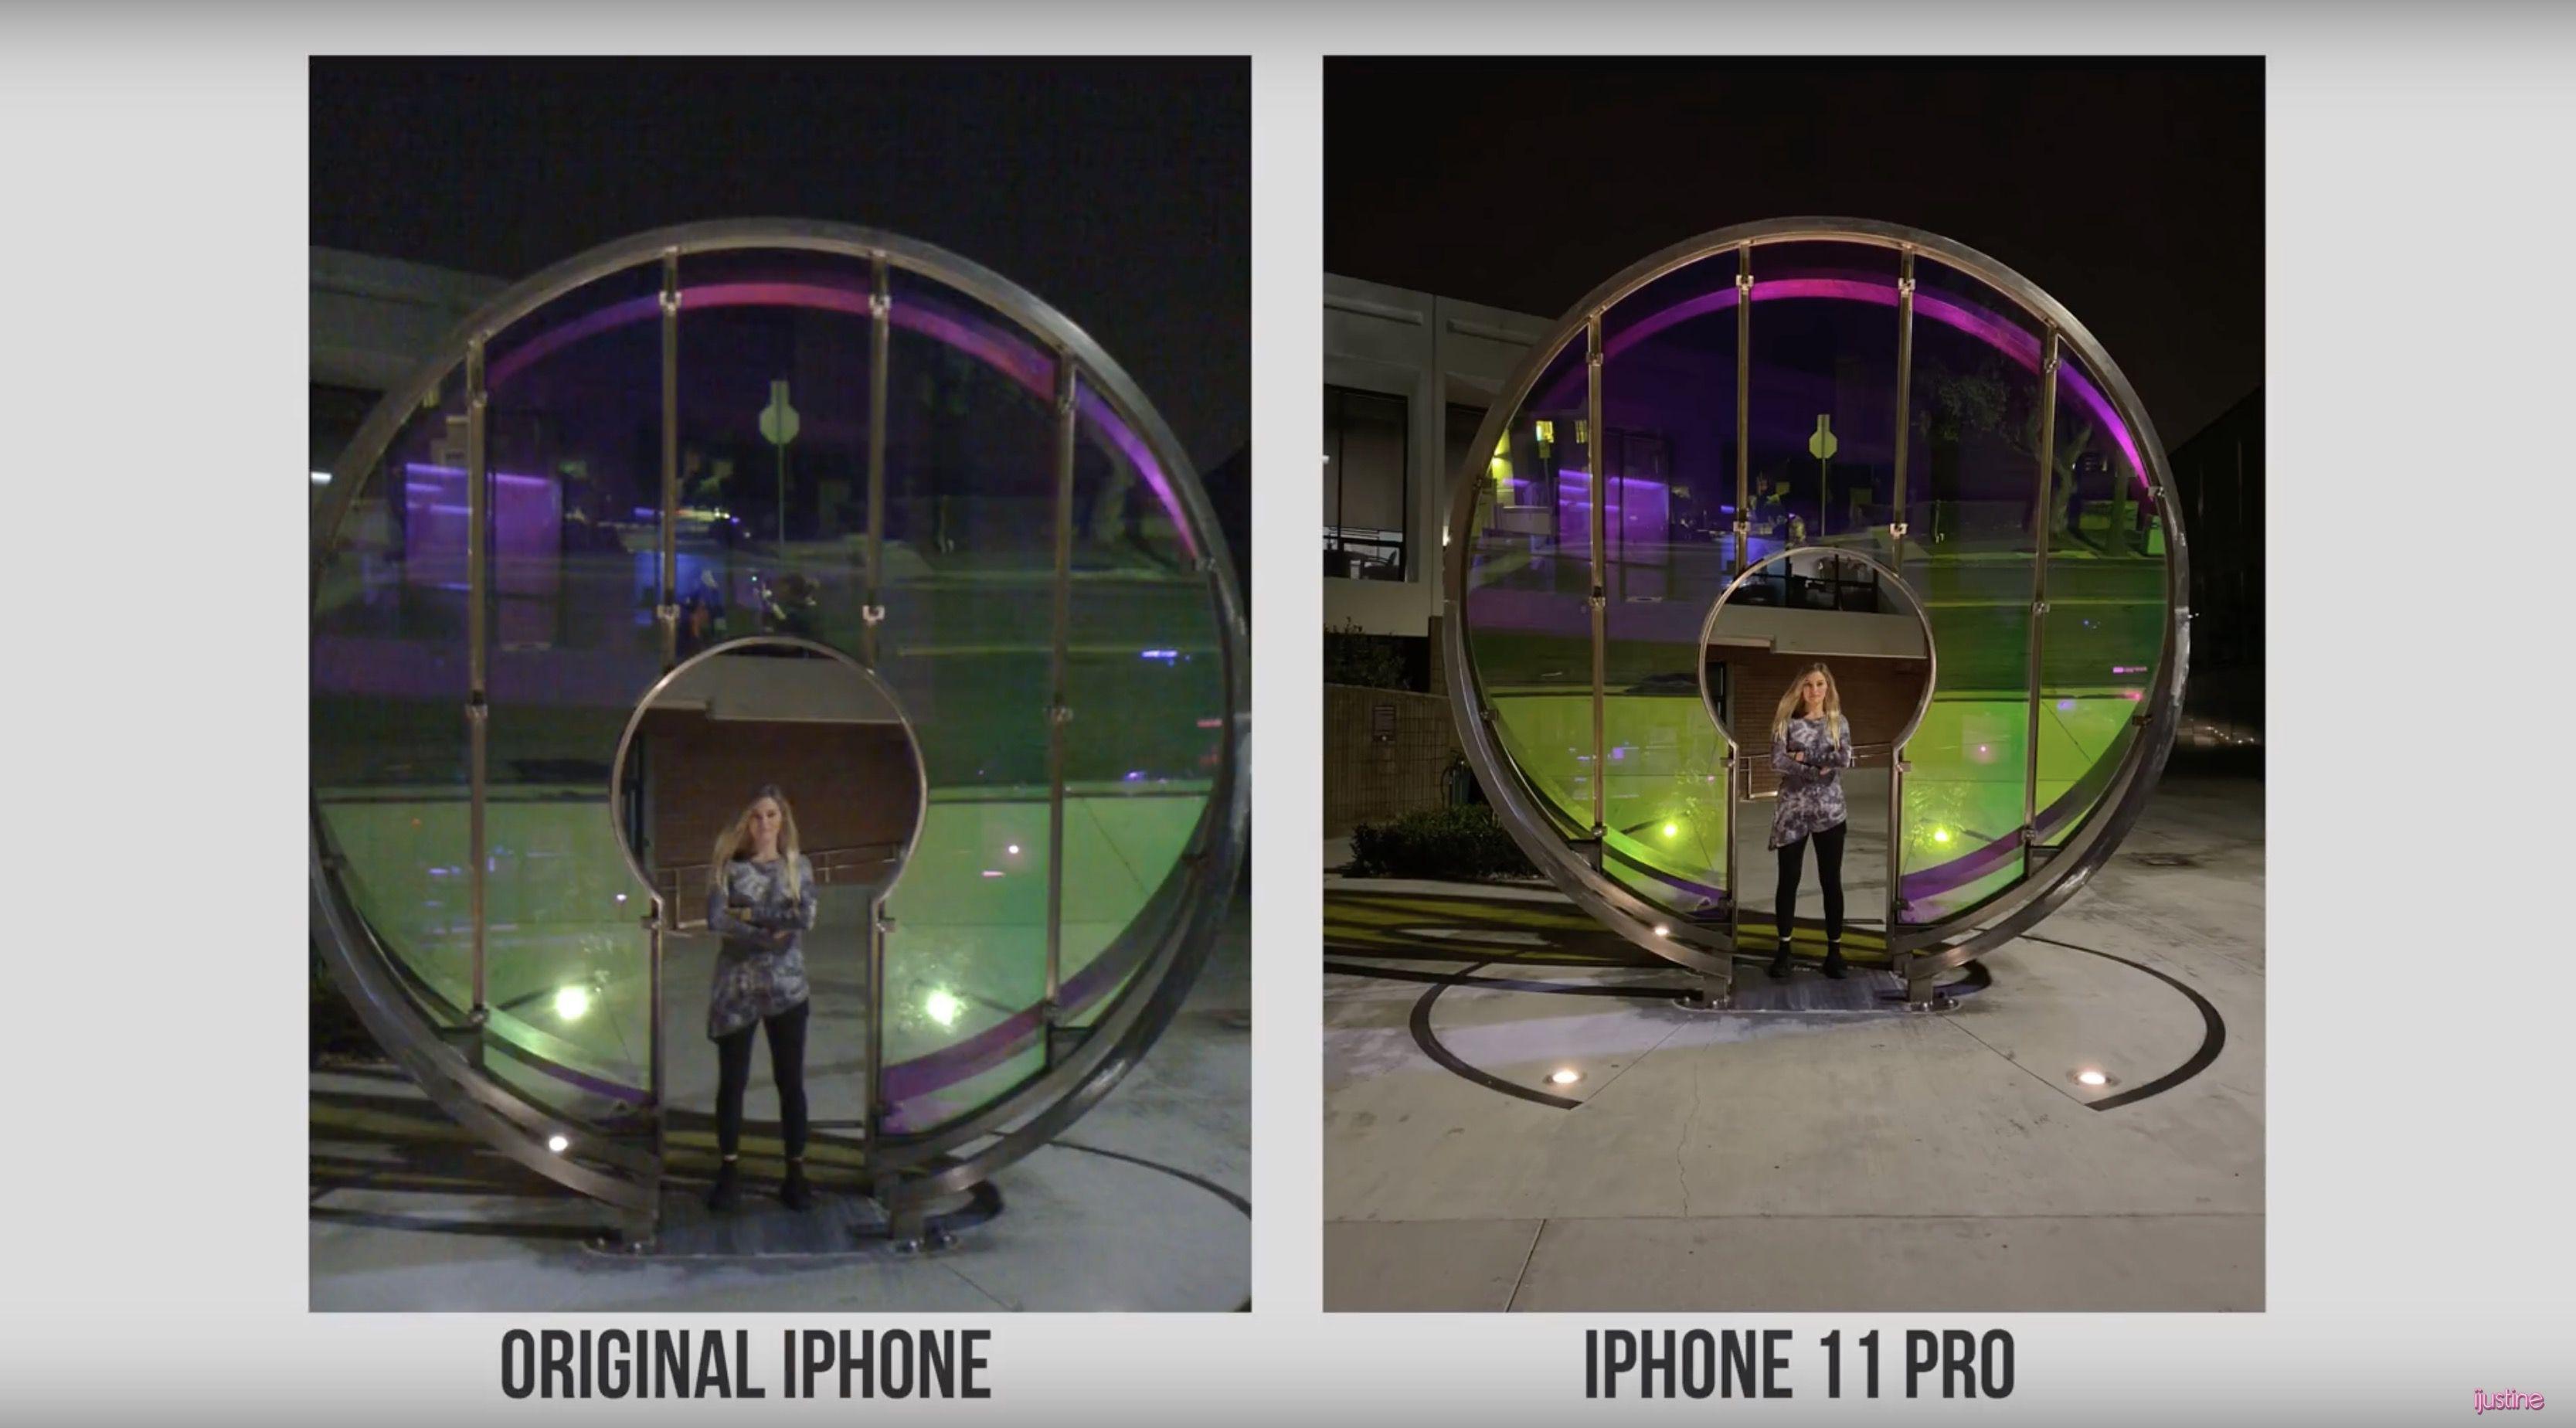 iPhone 11 Pro camera vs. original iPhone night shot